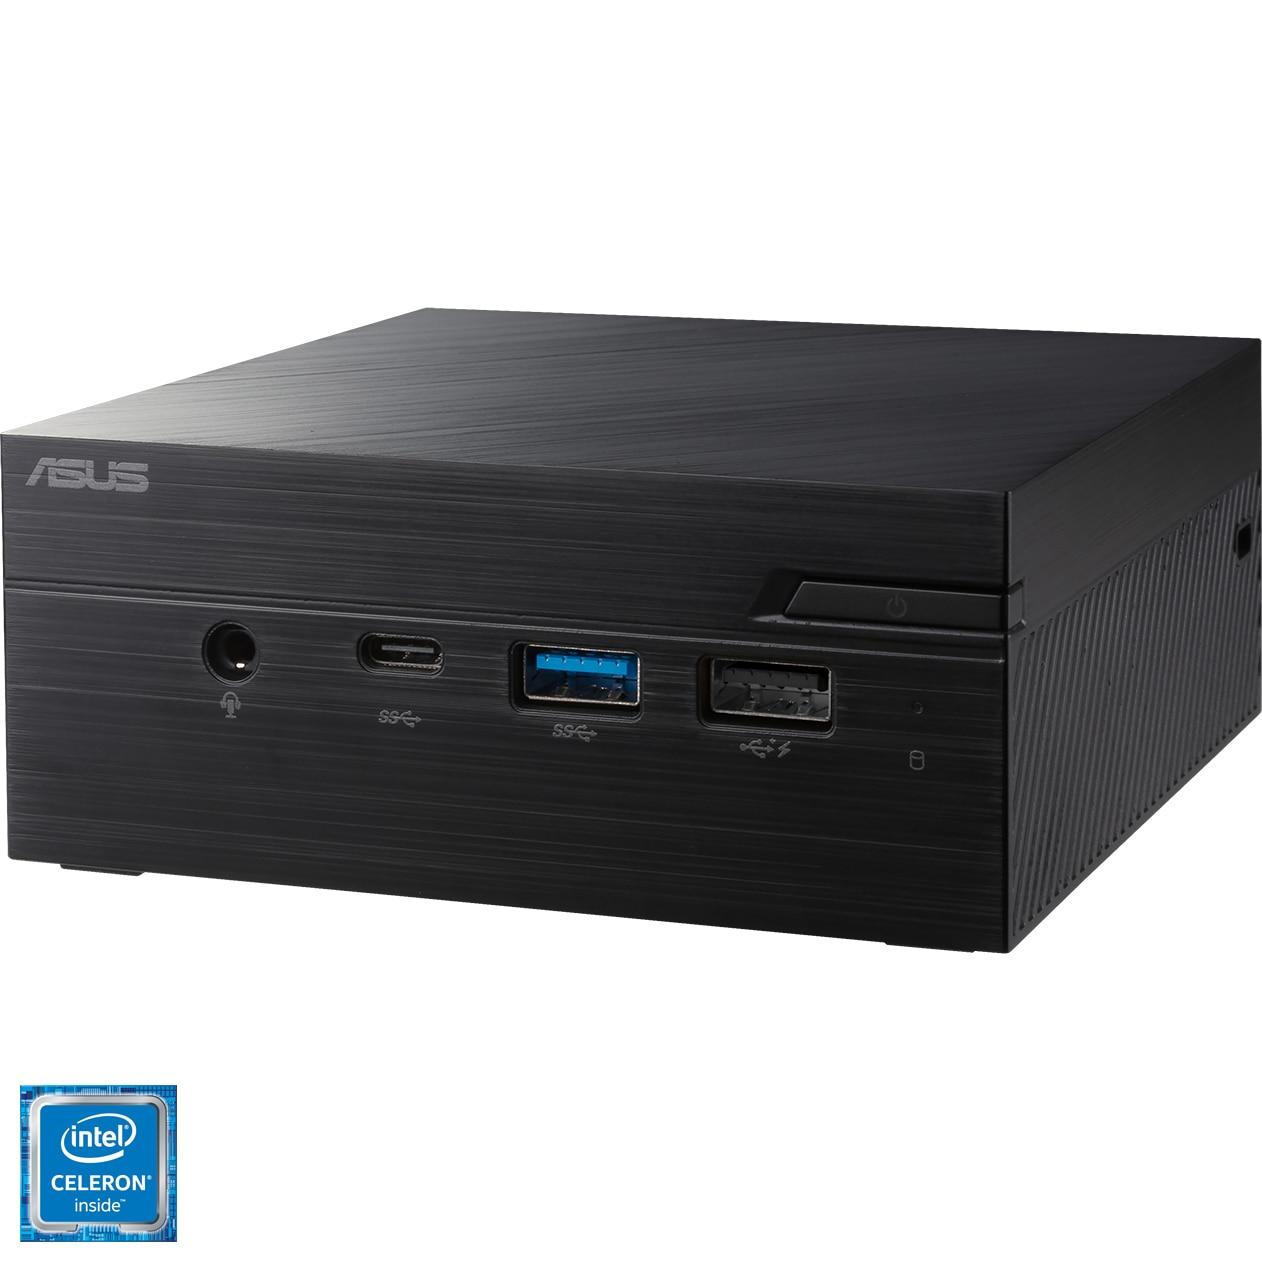 Fotografie Mini PC ASUS PN40-BBC533MV cu procesor Intel Celeron® J4025 pana la 2.90GHz, fara RAM, fara stocare, Intel® UHD Graphics 600, No OS